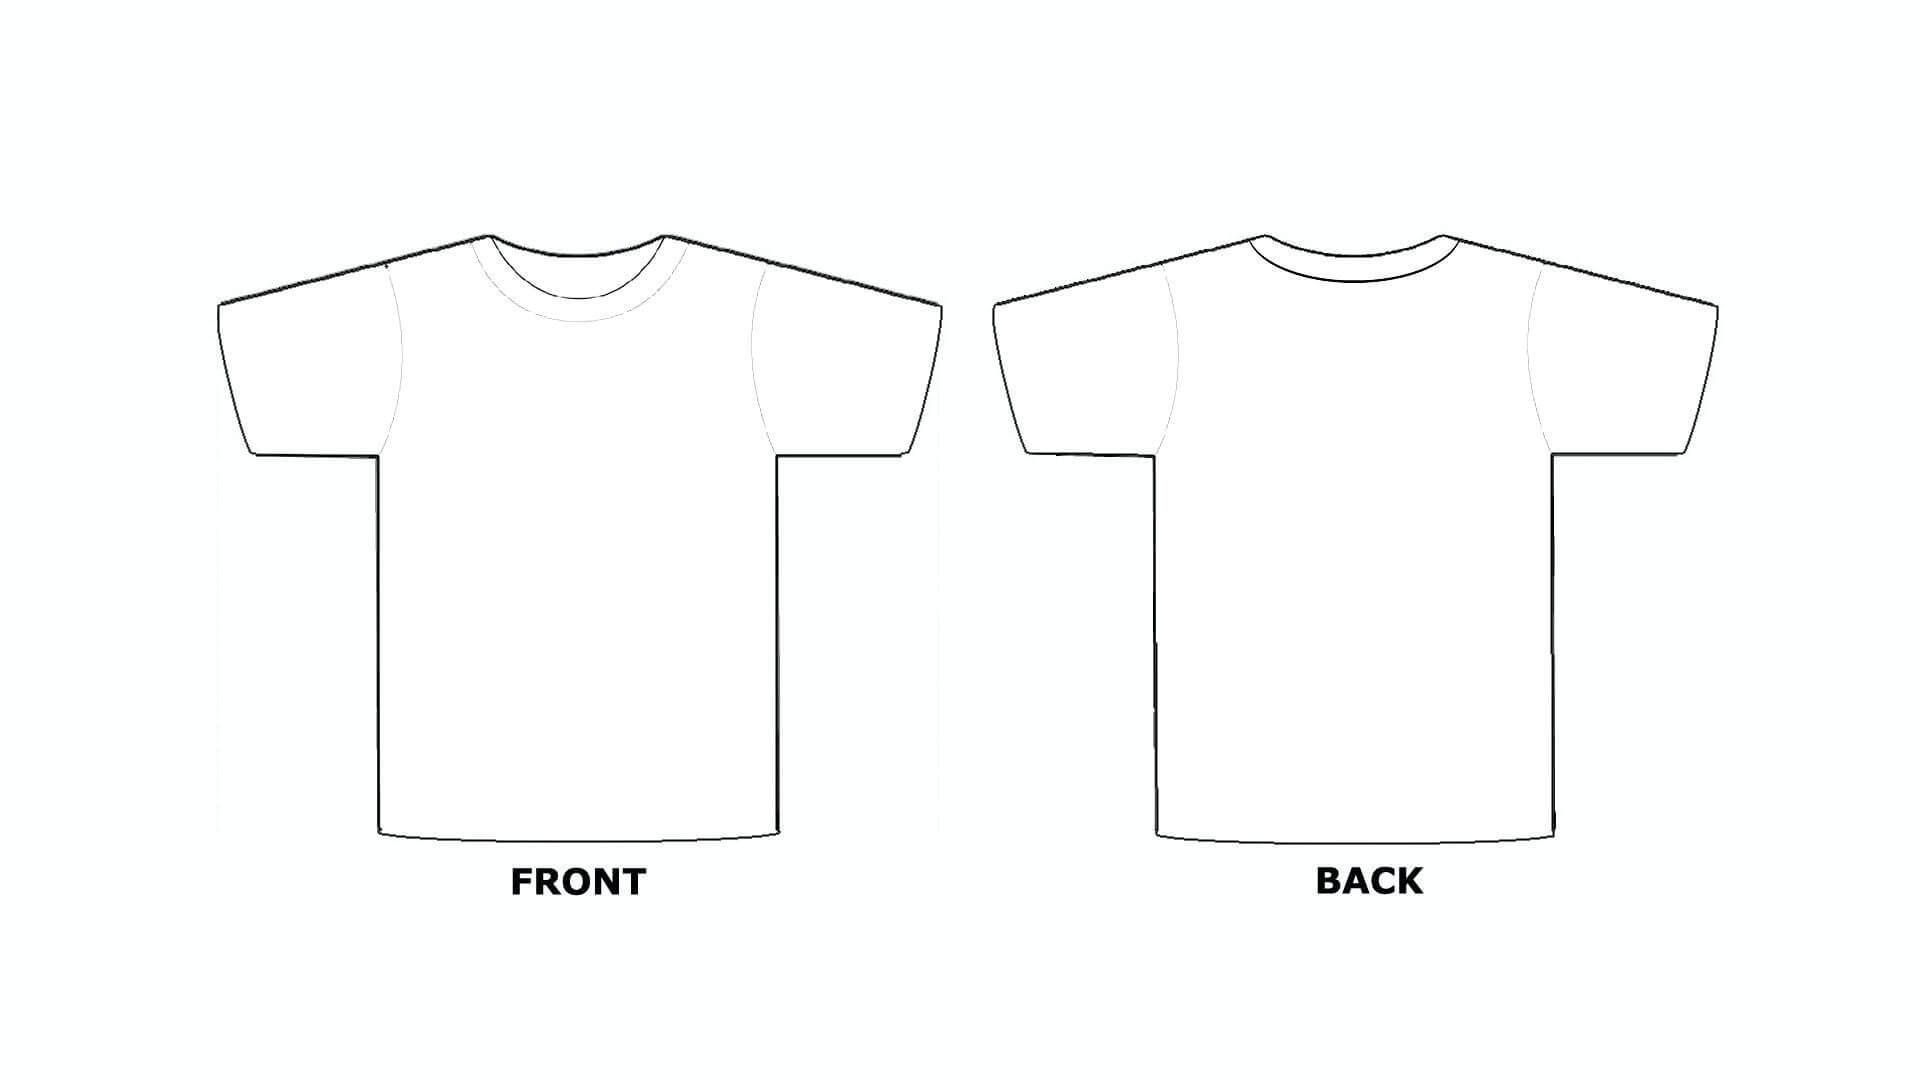 Printable Blank Tshirt Template - C Punkt Intended For Blank Tshirt Template Printable